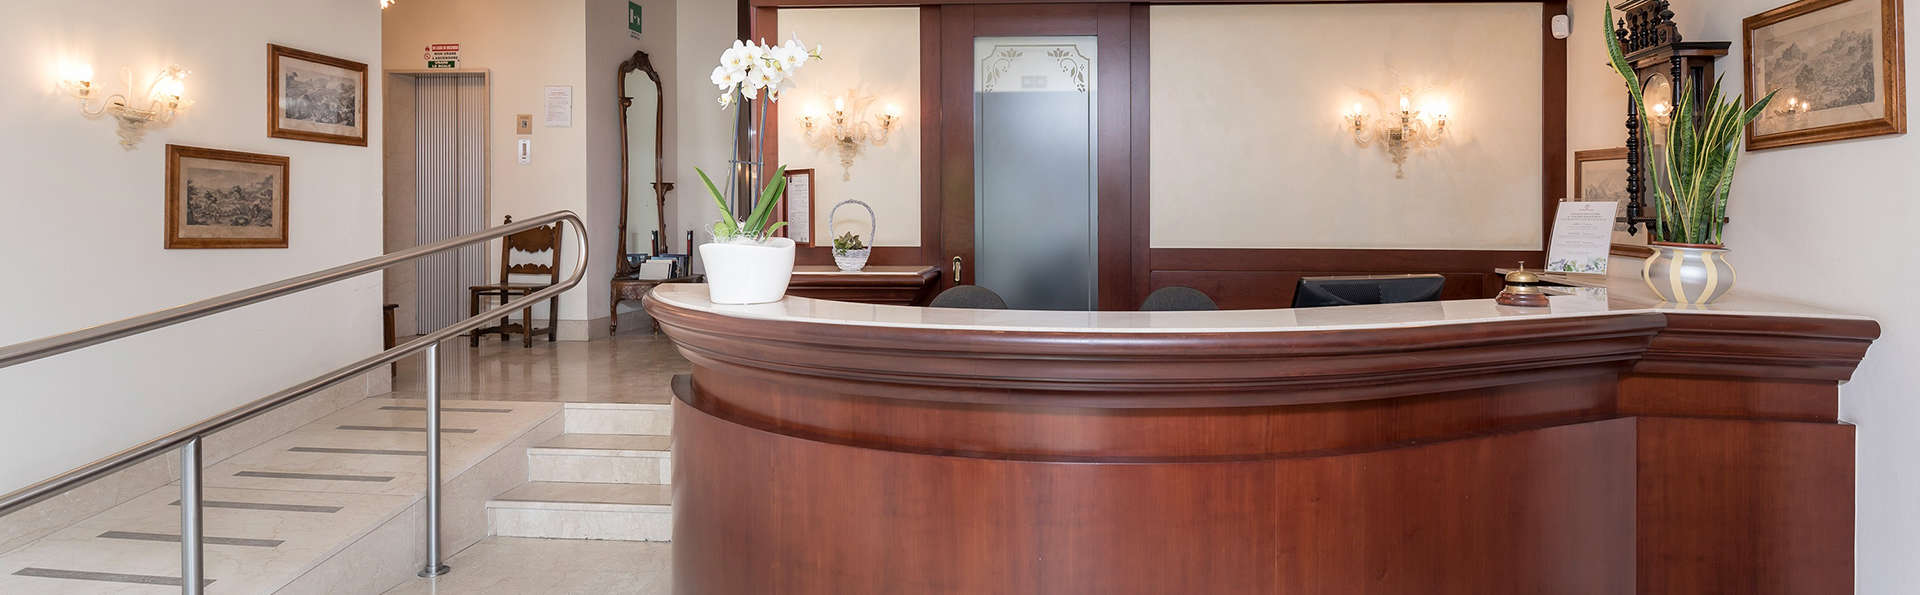 Hotel Terme San Pancrazio - Edit_Reception.jpg